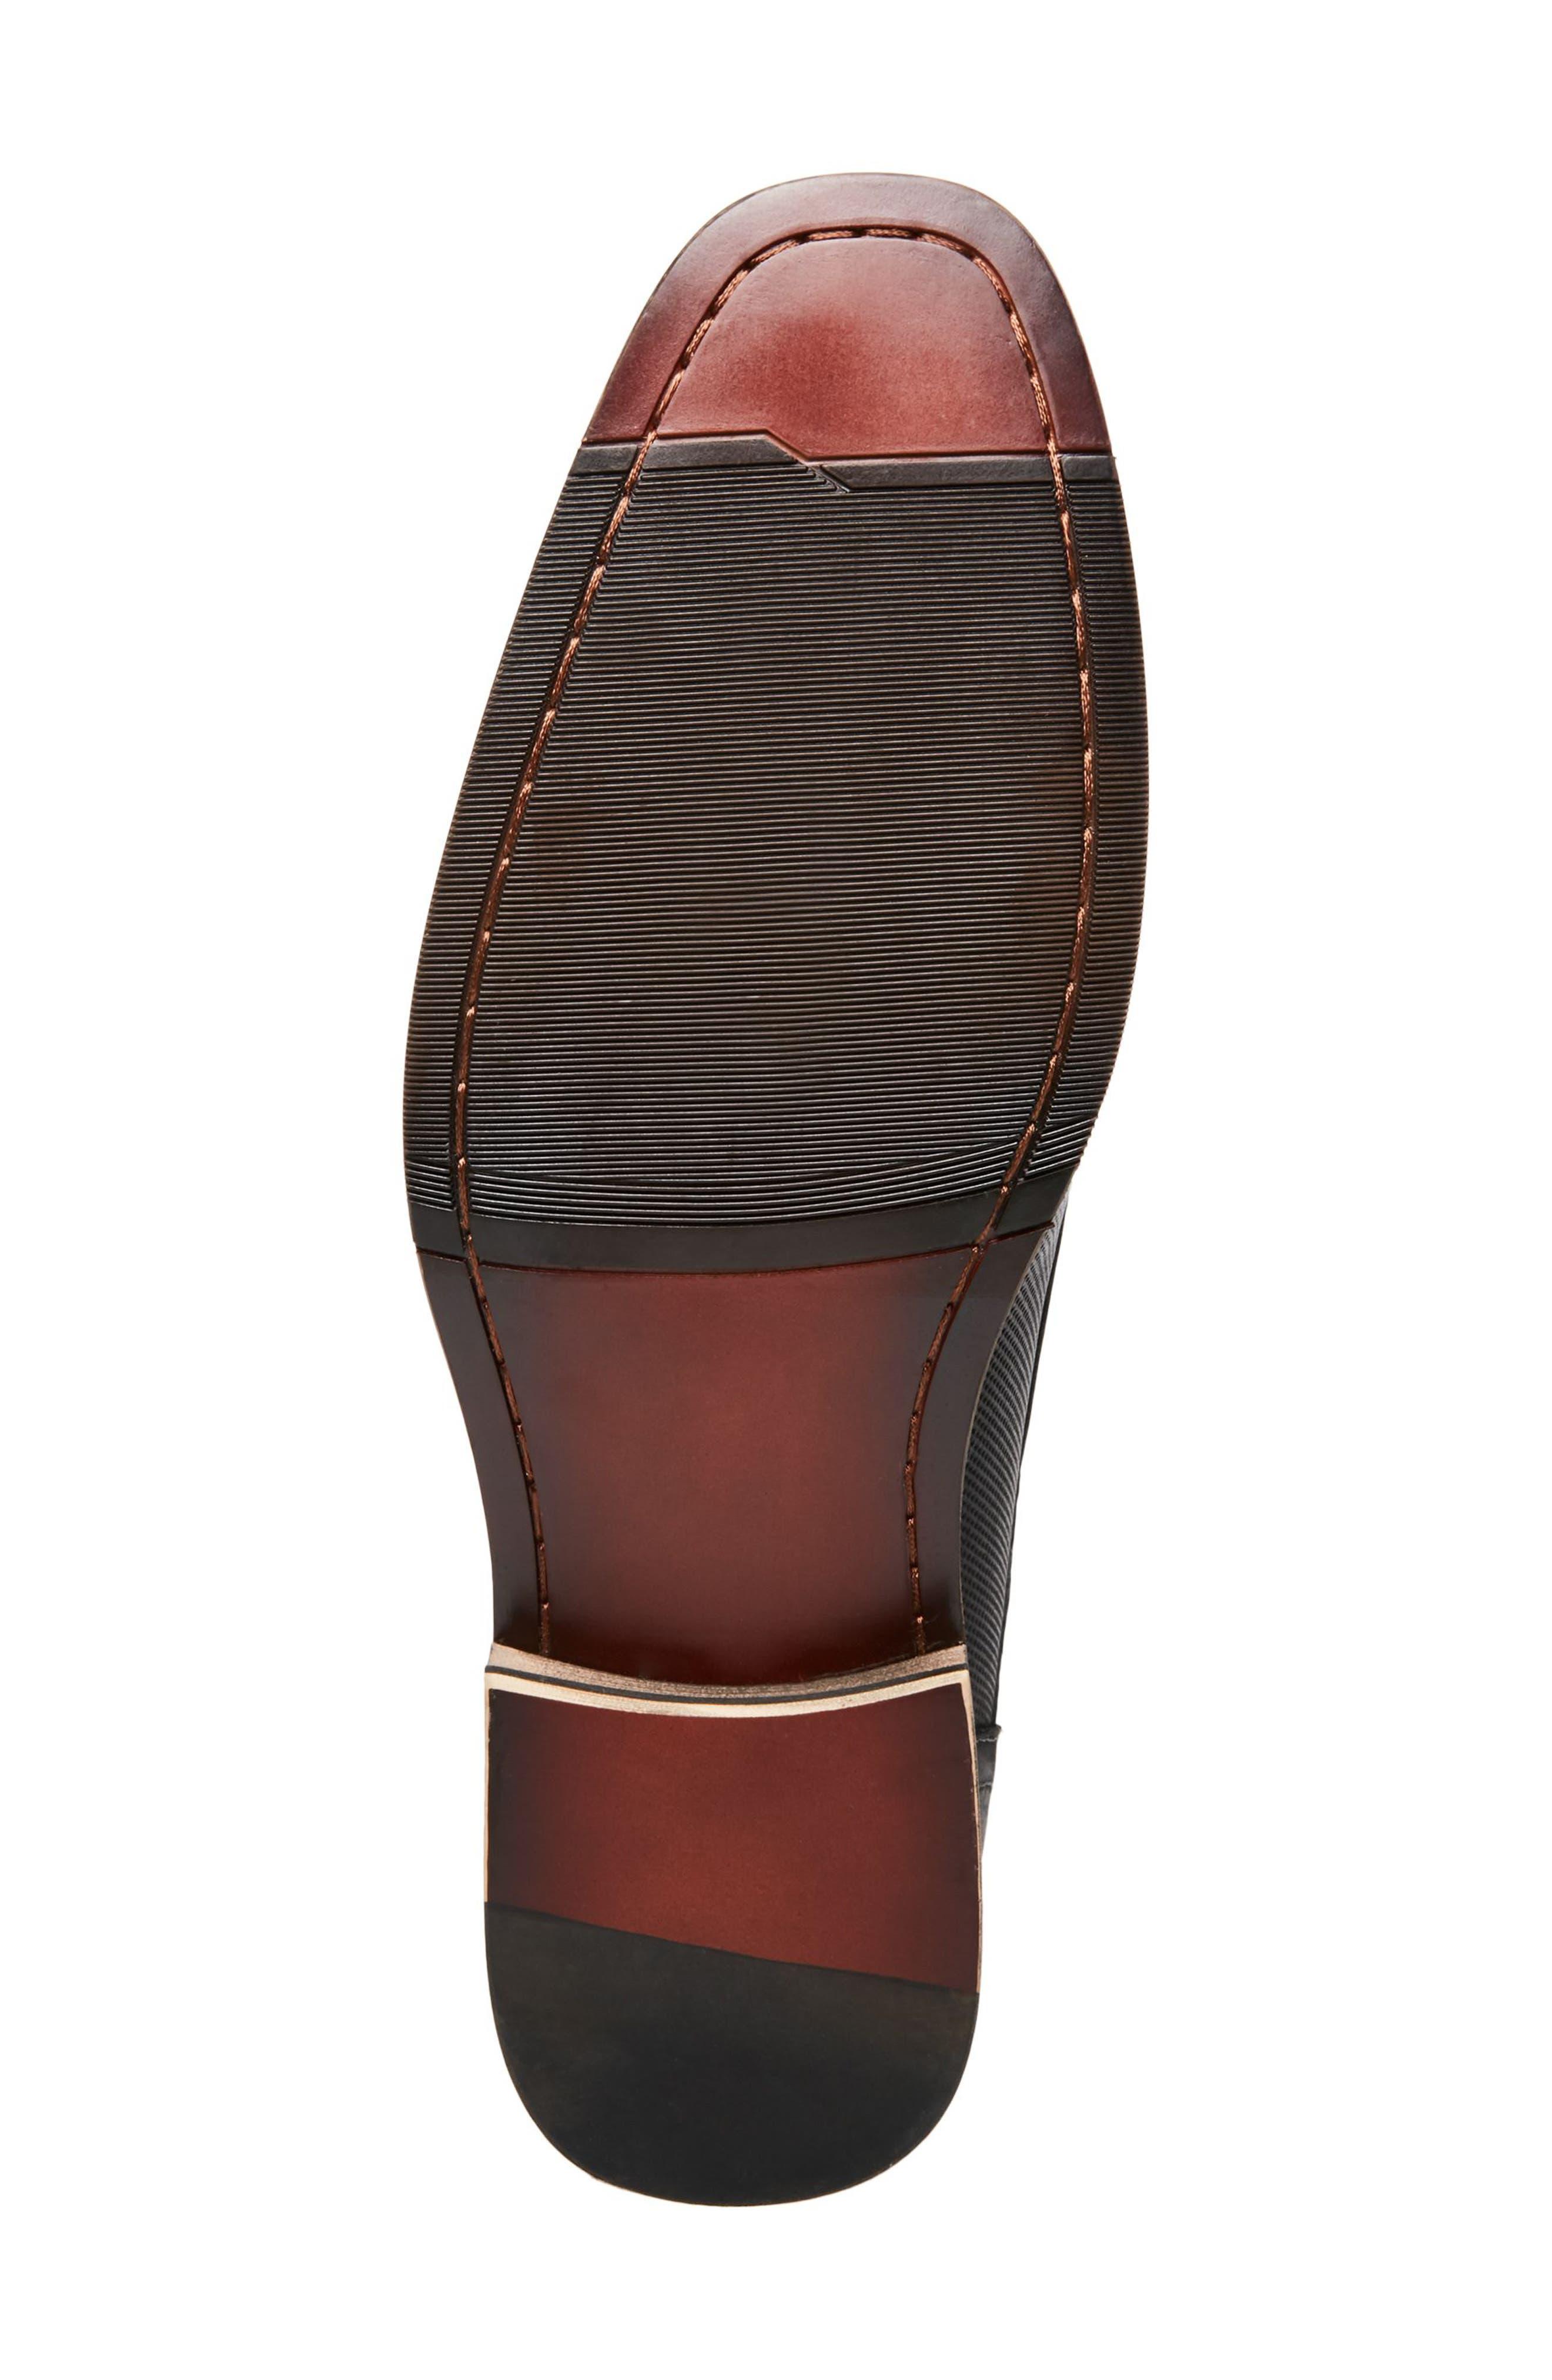 Jaysun Embossed Plain Toe Derby,                             Alternate thumbnail 6, color,                             Dark Grey Leather